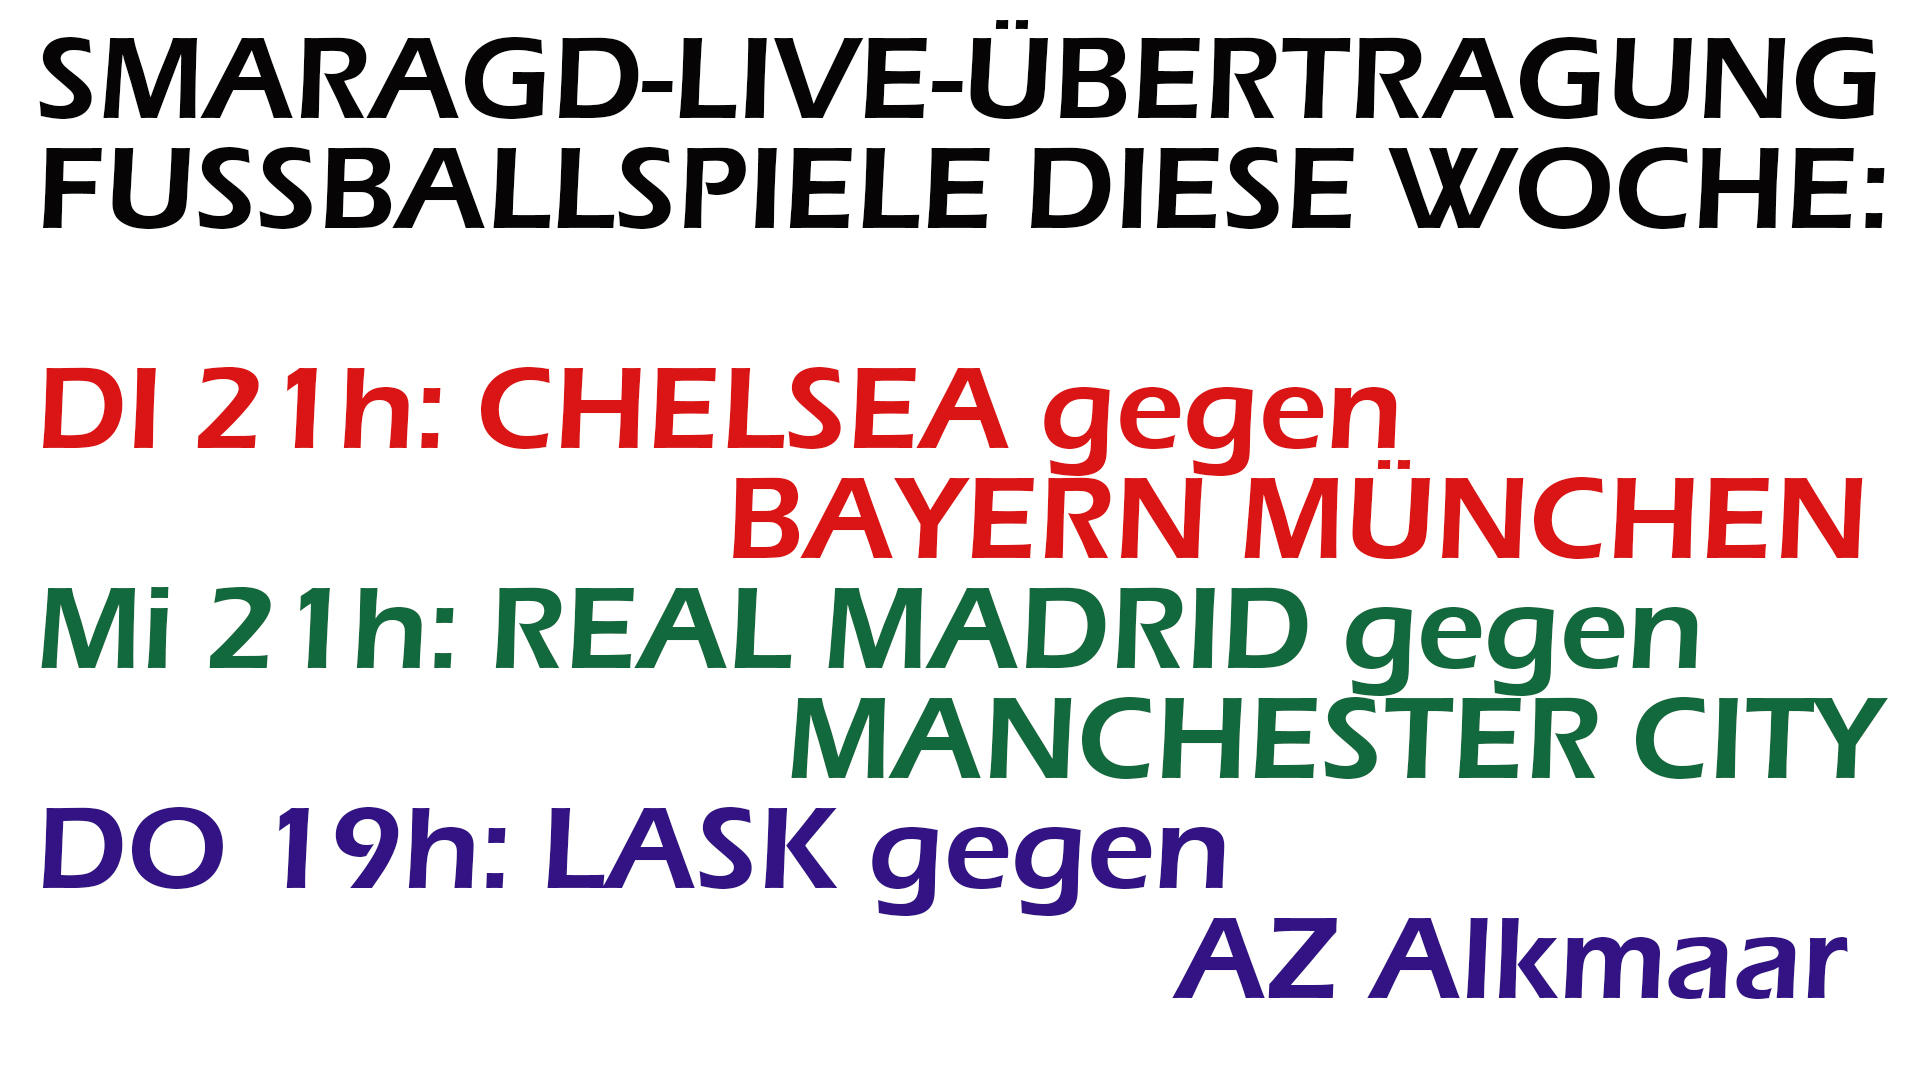 fussballwoche-tv